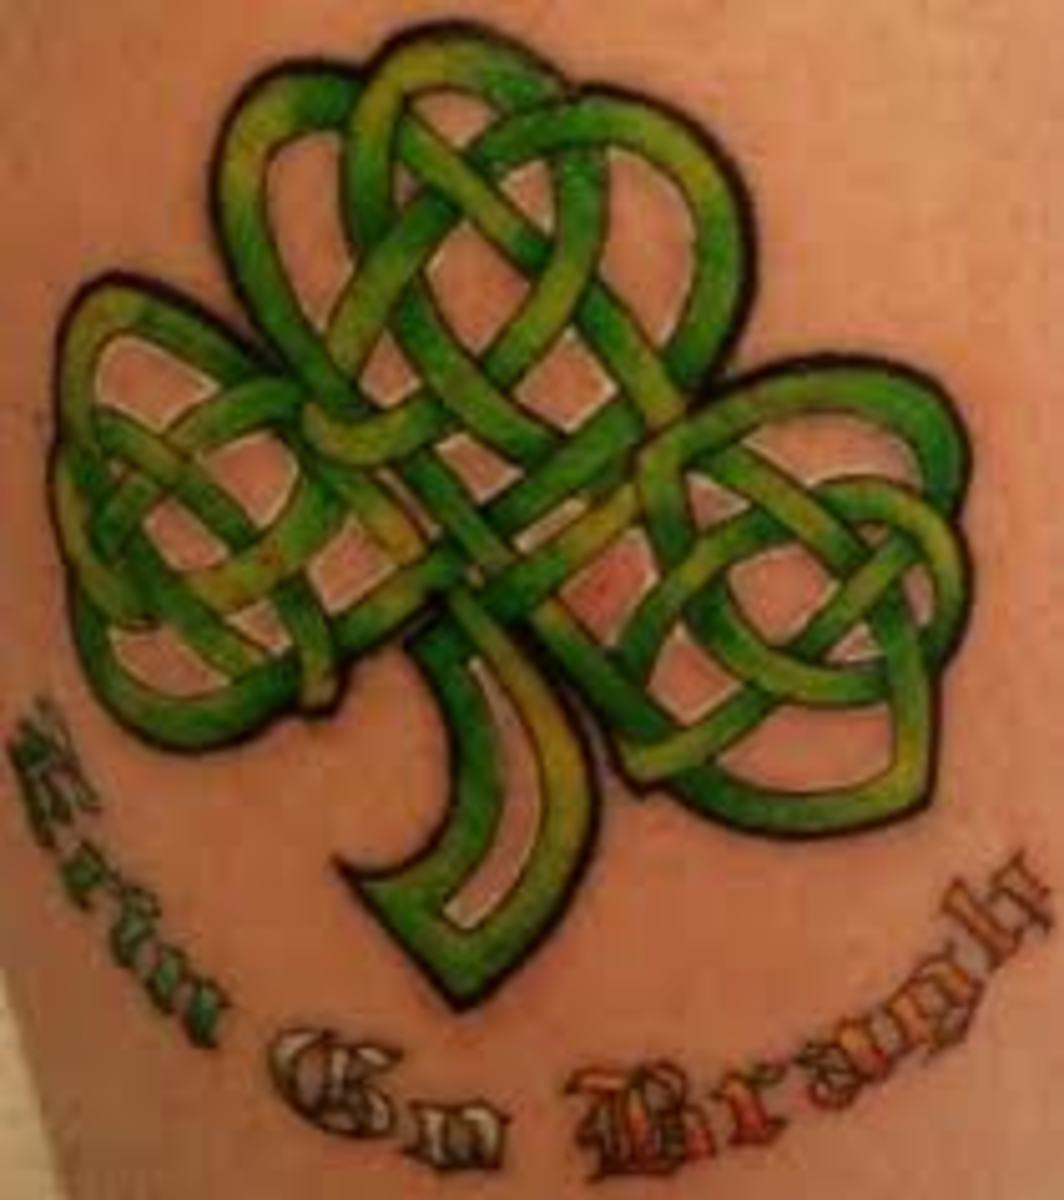 celtic-tattoo-designs-and-celtic-tattoo-meanings-popular-celtic-tattoos-and-meanings